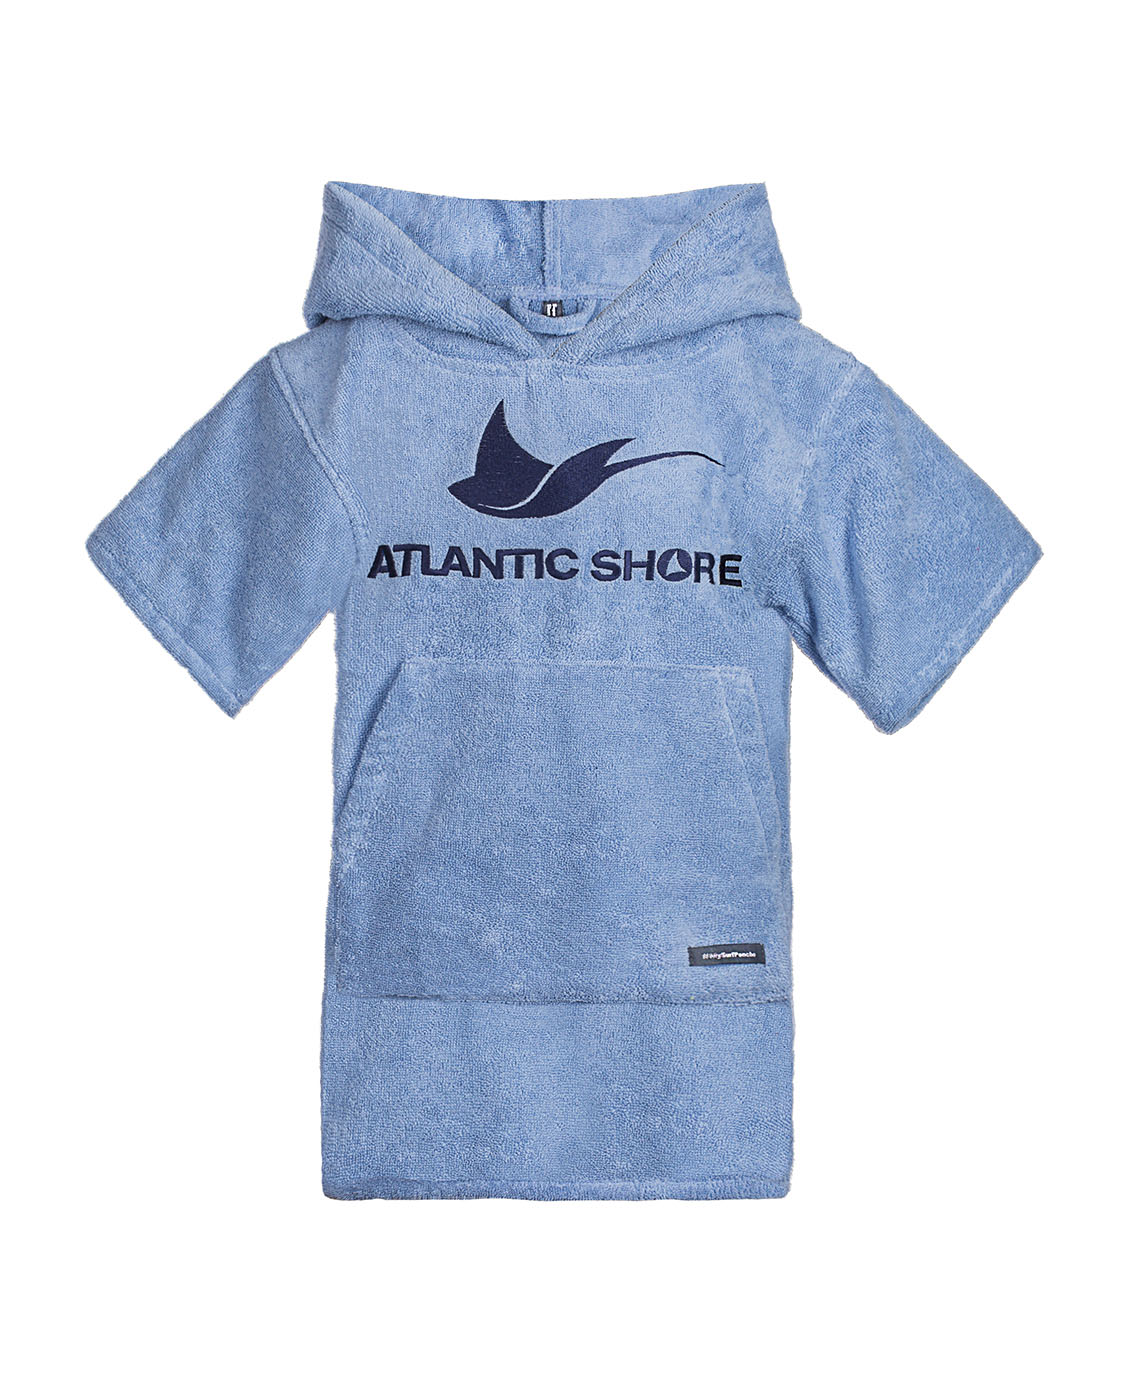 Atlantic Shore | Surf Poncho | Basic | Kids | Light Blue